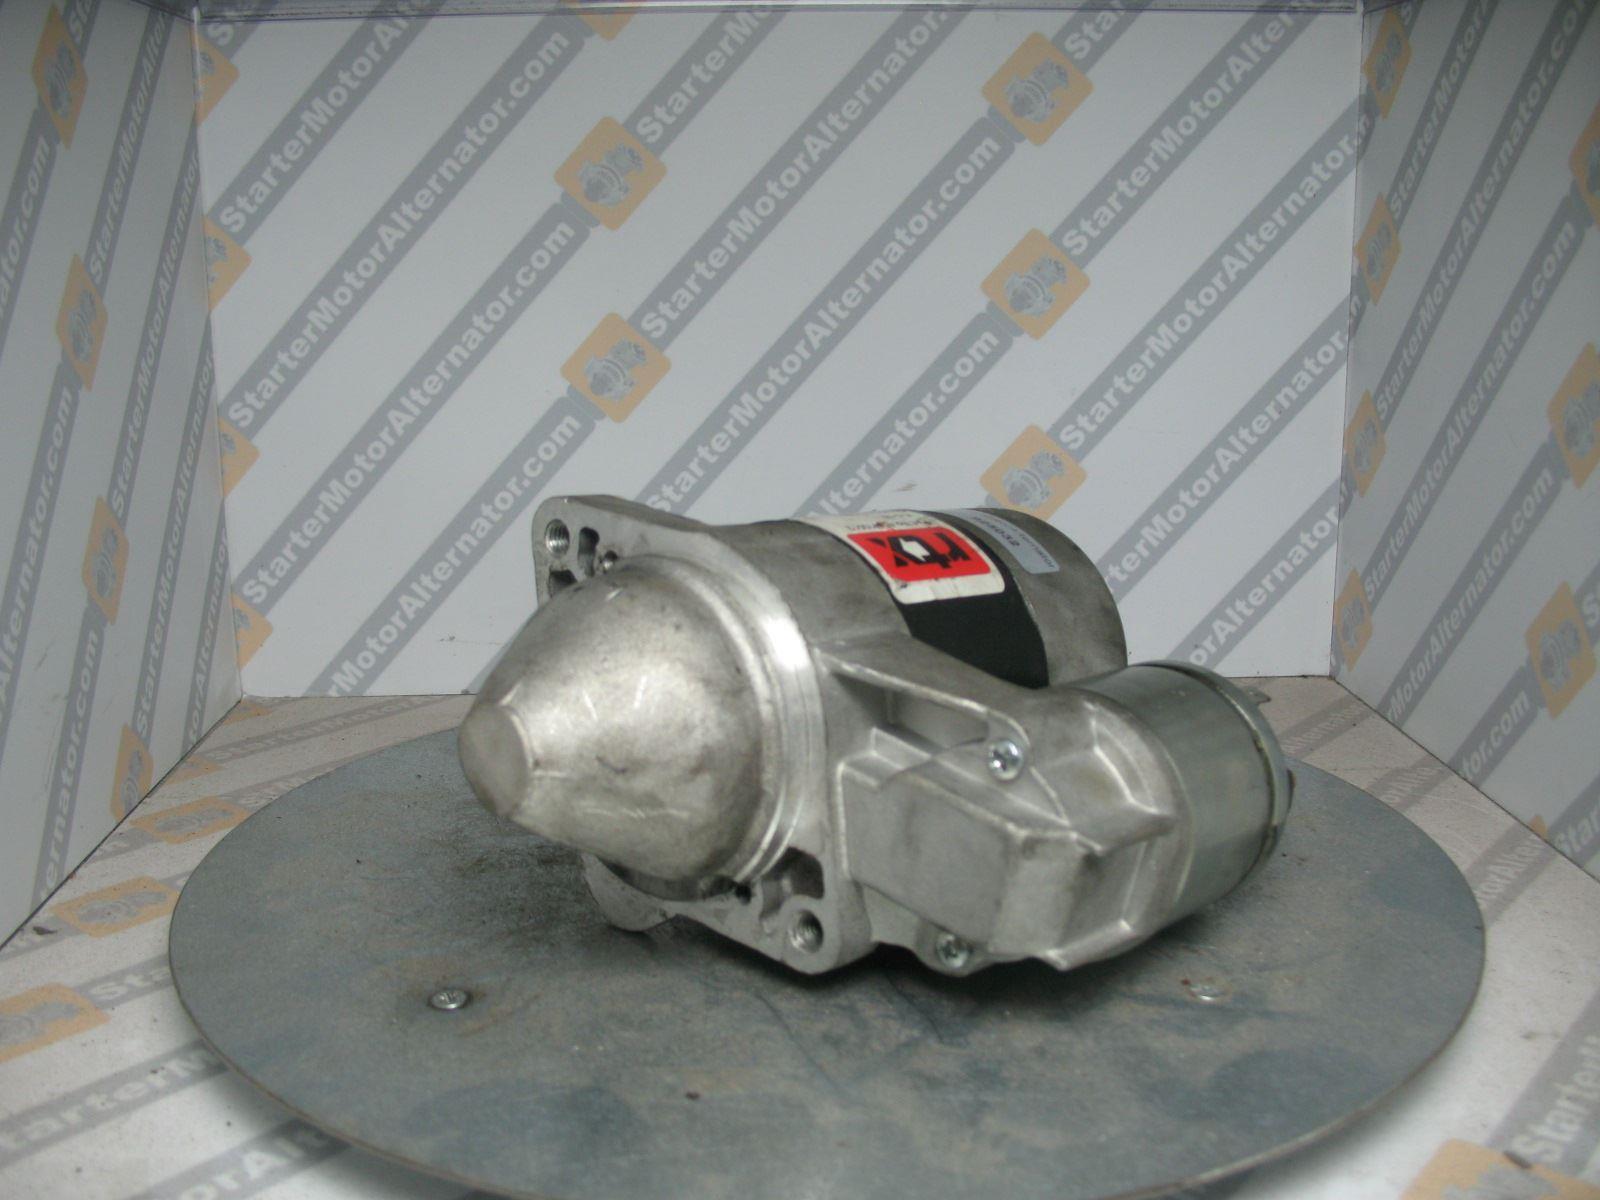 XIU1206 Starter Motor For Smart